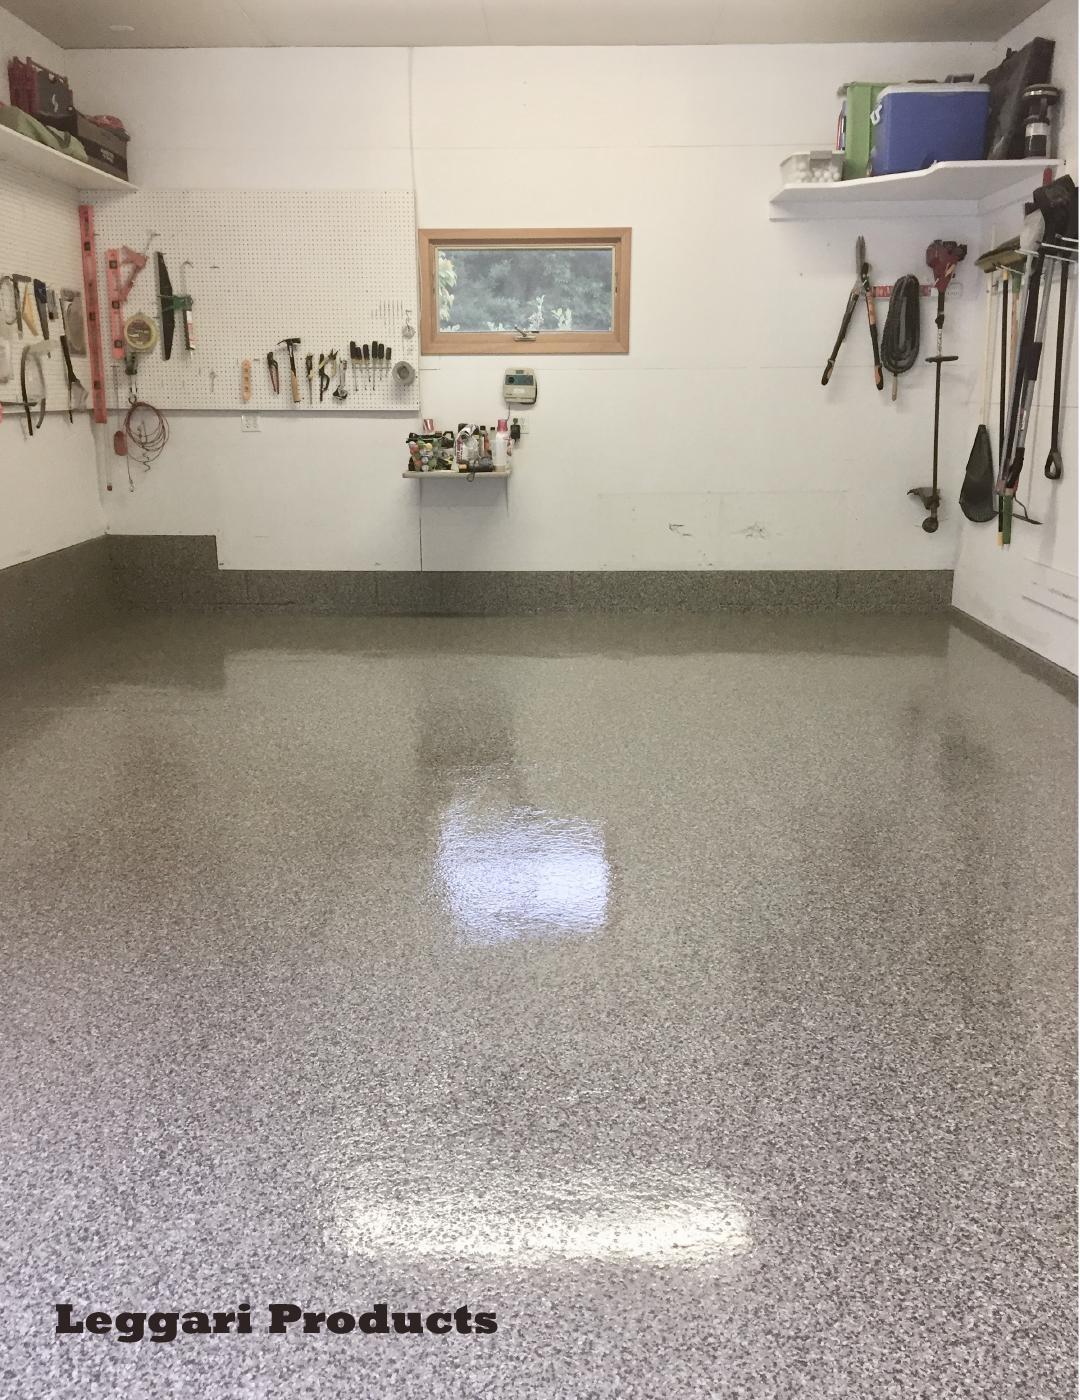 Pin By Leggari Products Diy Kits To On Garage Flooring In 2020 Diy Flooring Flooring Garage Remodel